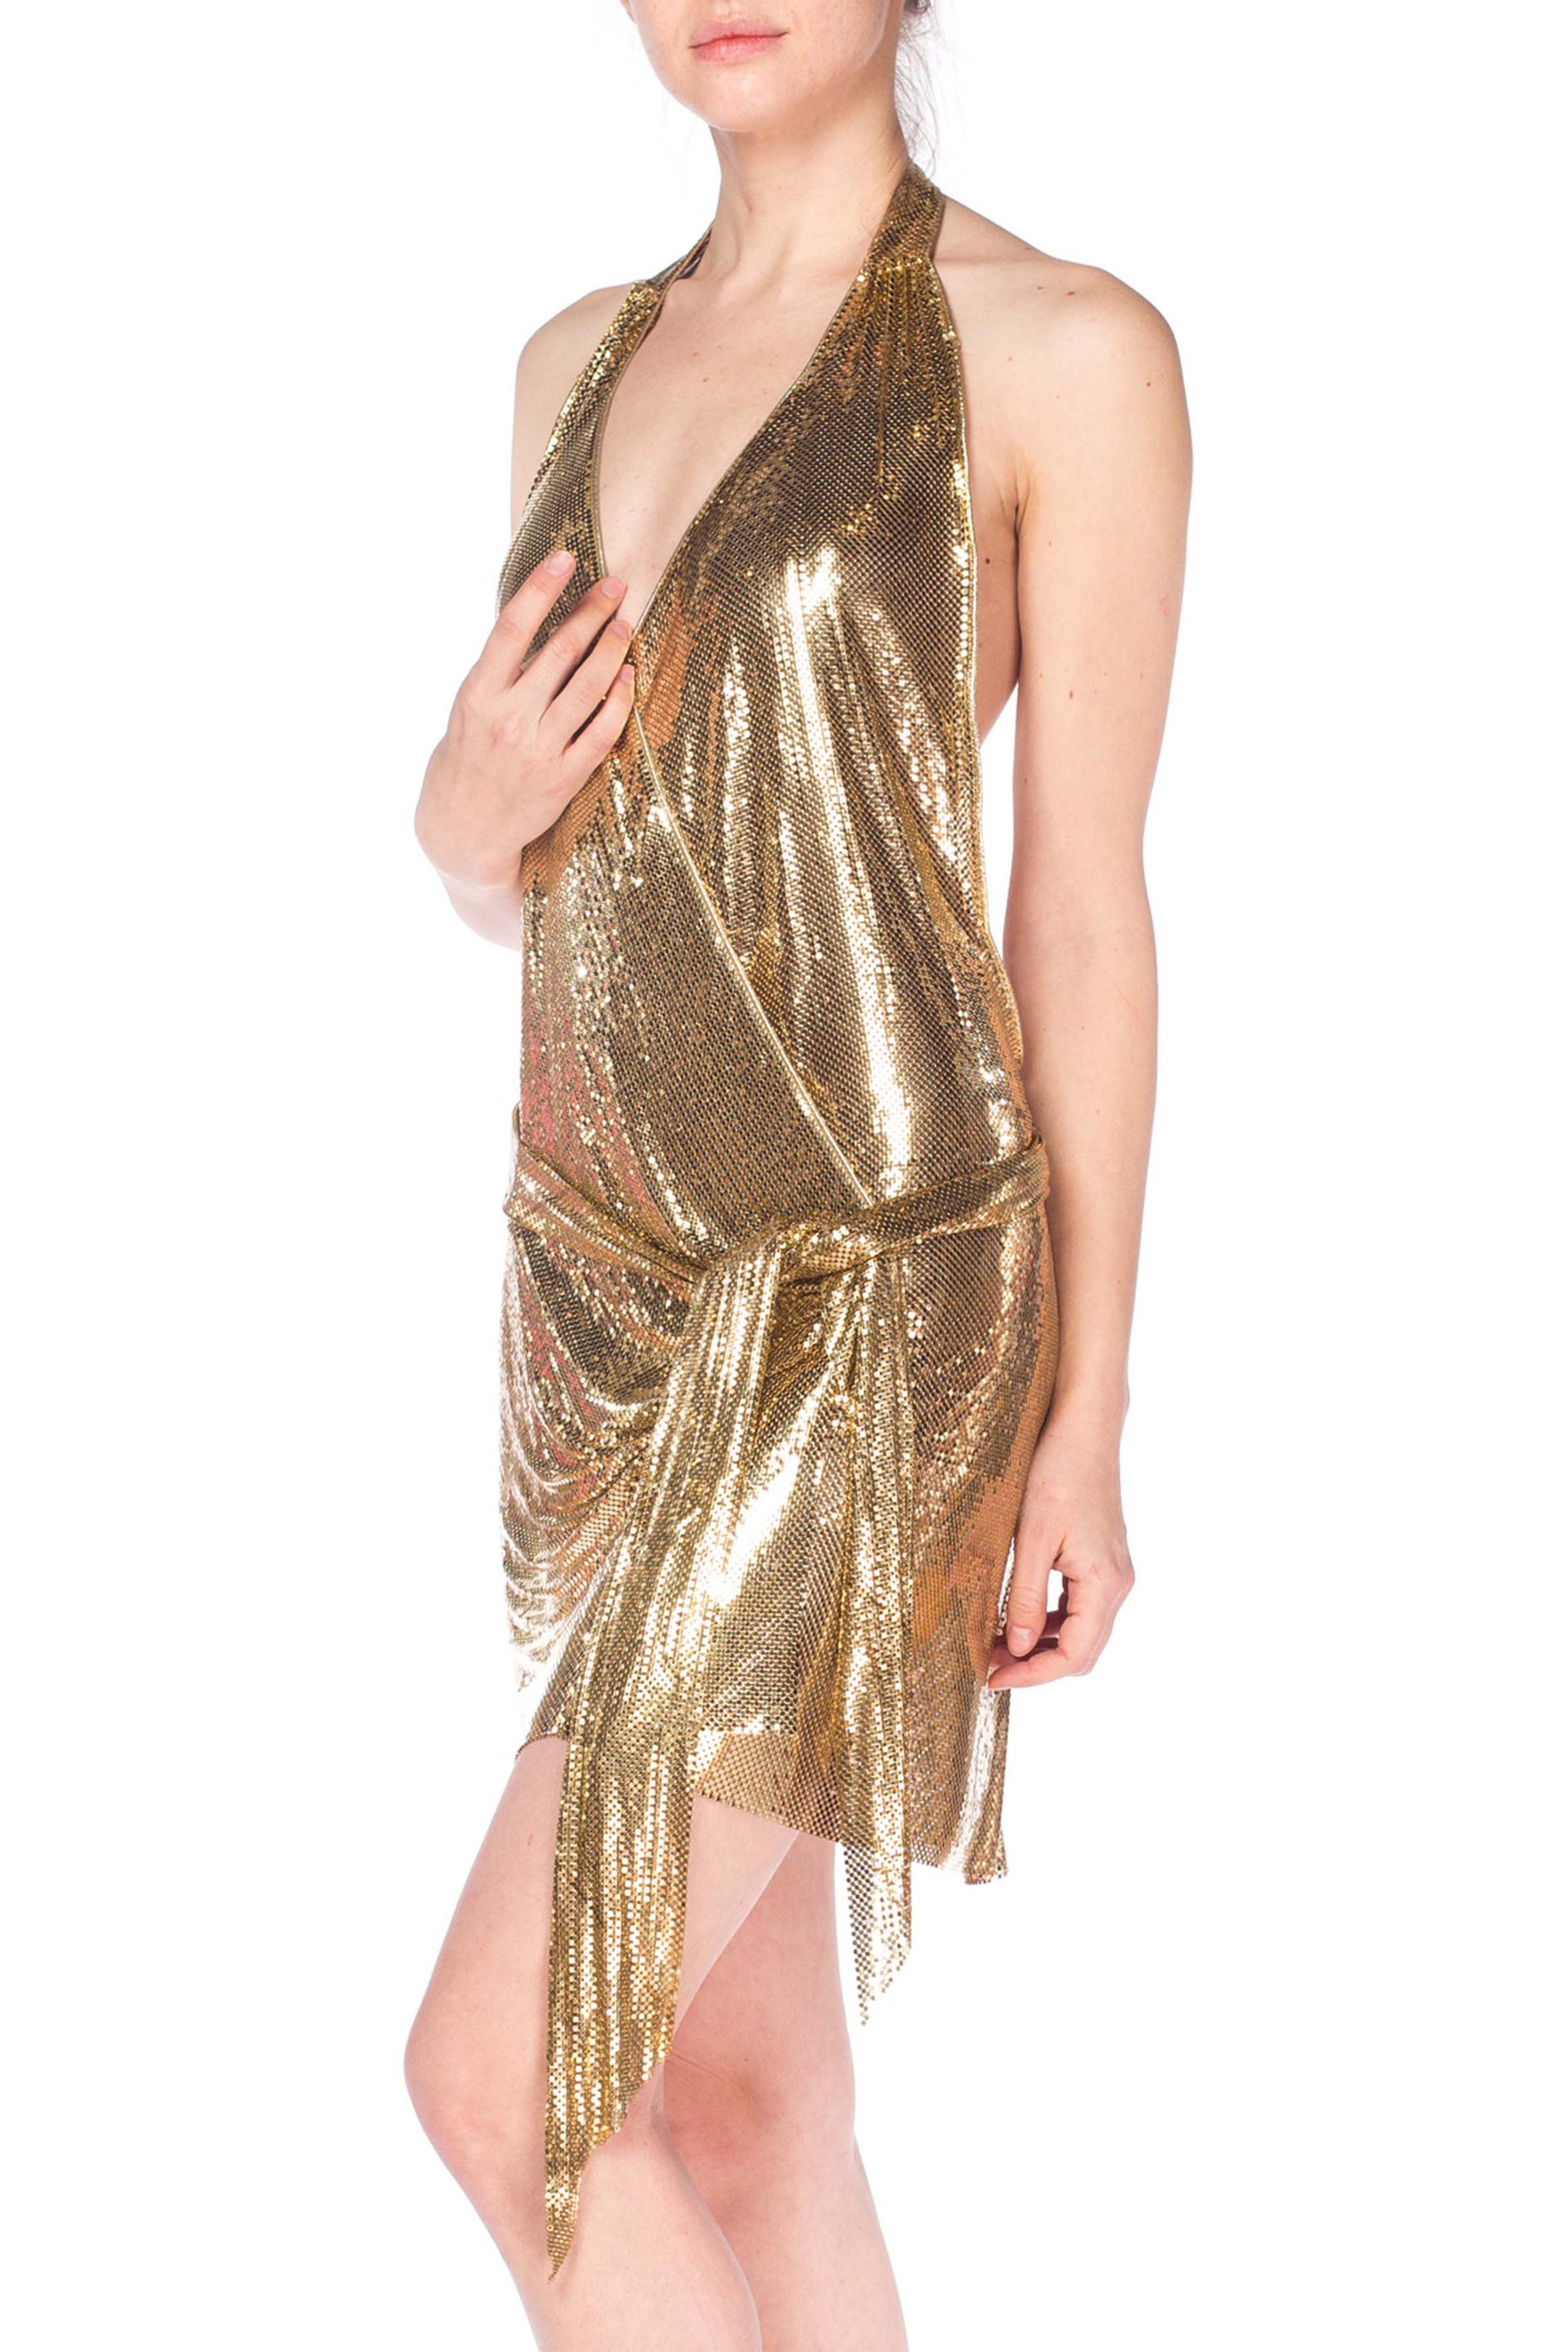 Morphew Backless Gold Metal Mesh Wrap Halter Dress Morphew Pretty Short Dresses Shiny Dresses Metal Mesh Dress [ 5184 x 3456 Pixel ]